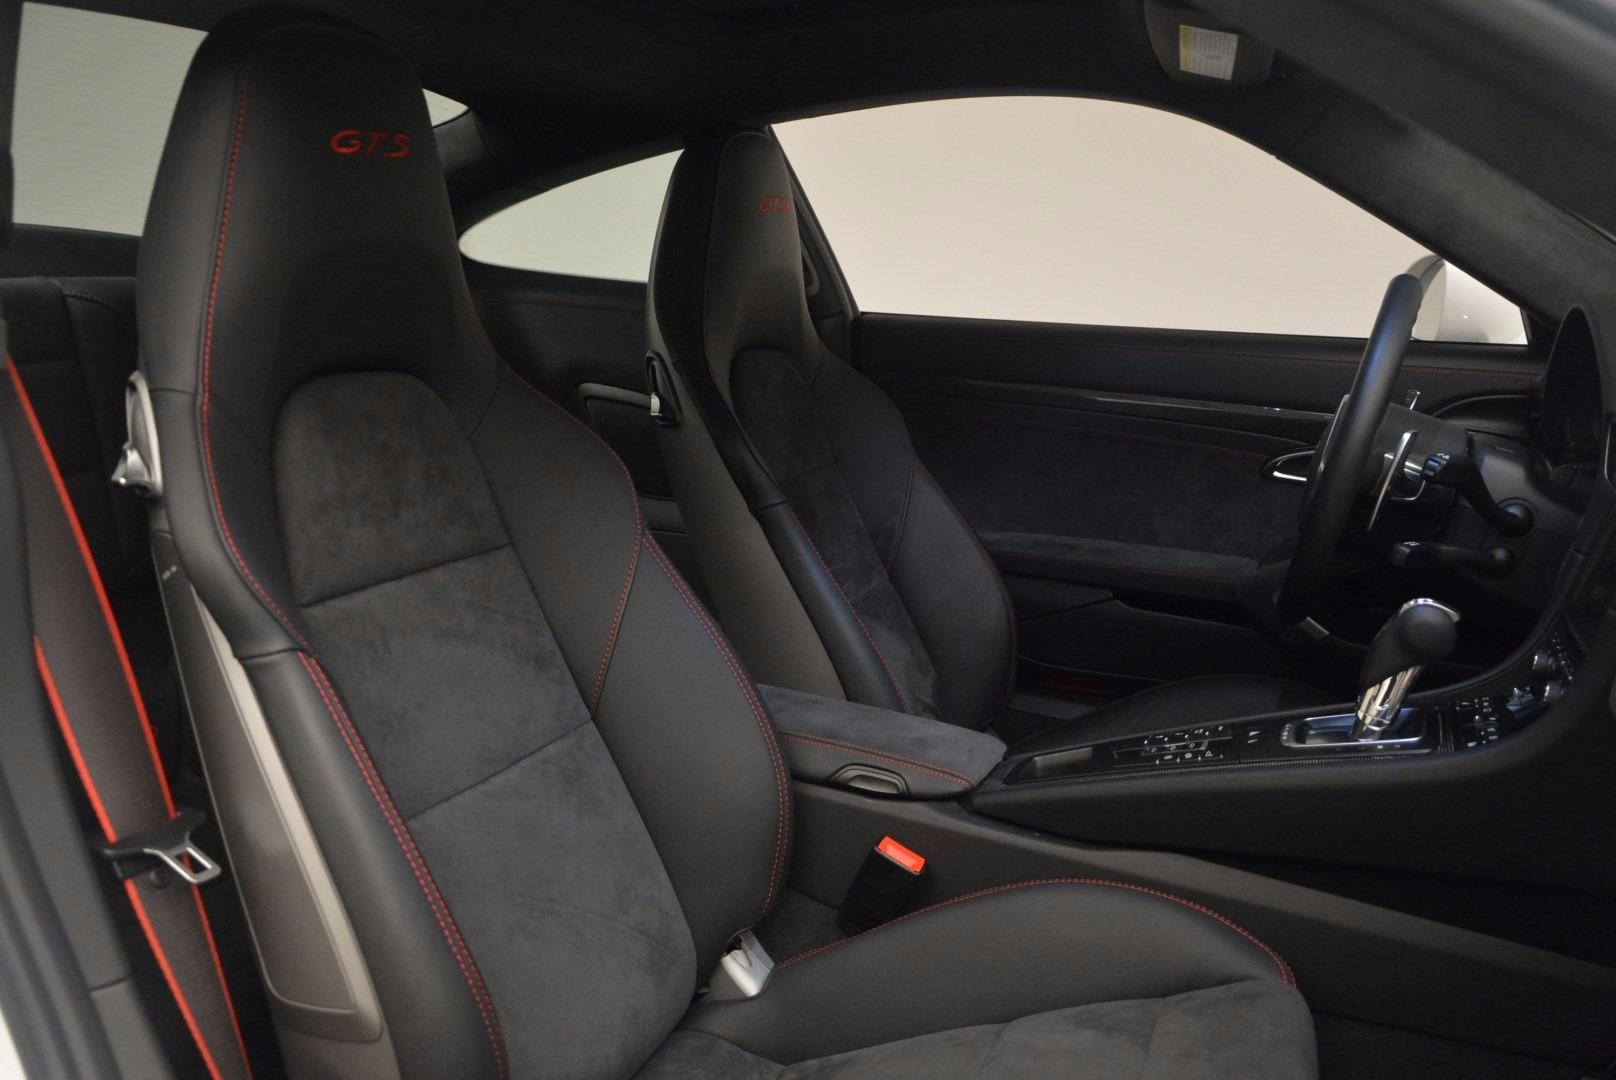 Used 2015 Porsche 911 Carrera GTS For Sale In Greenwich, CT 1444_p19